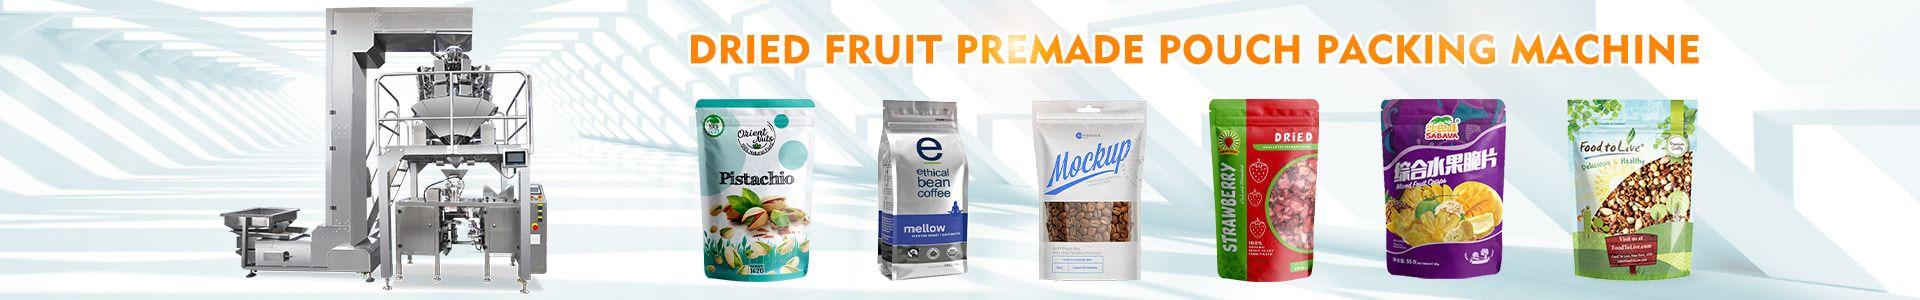 dry fruit packaging machine